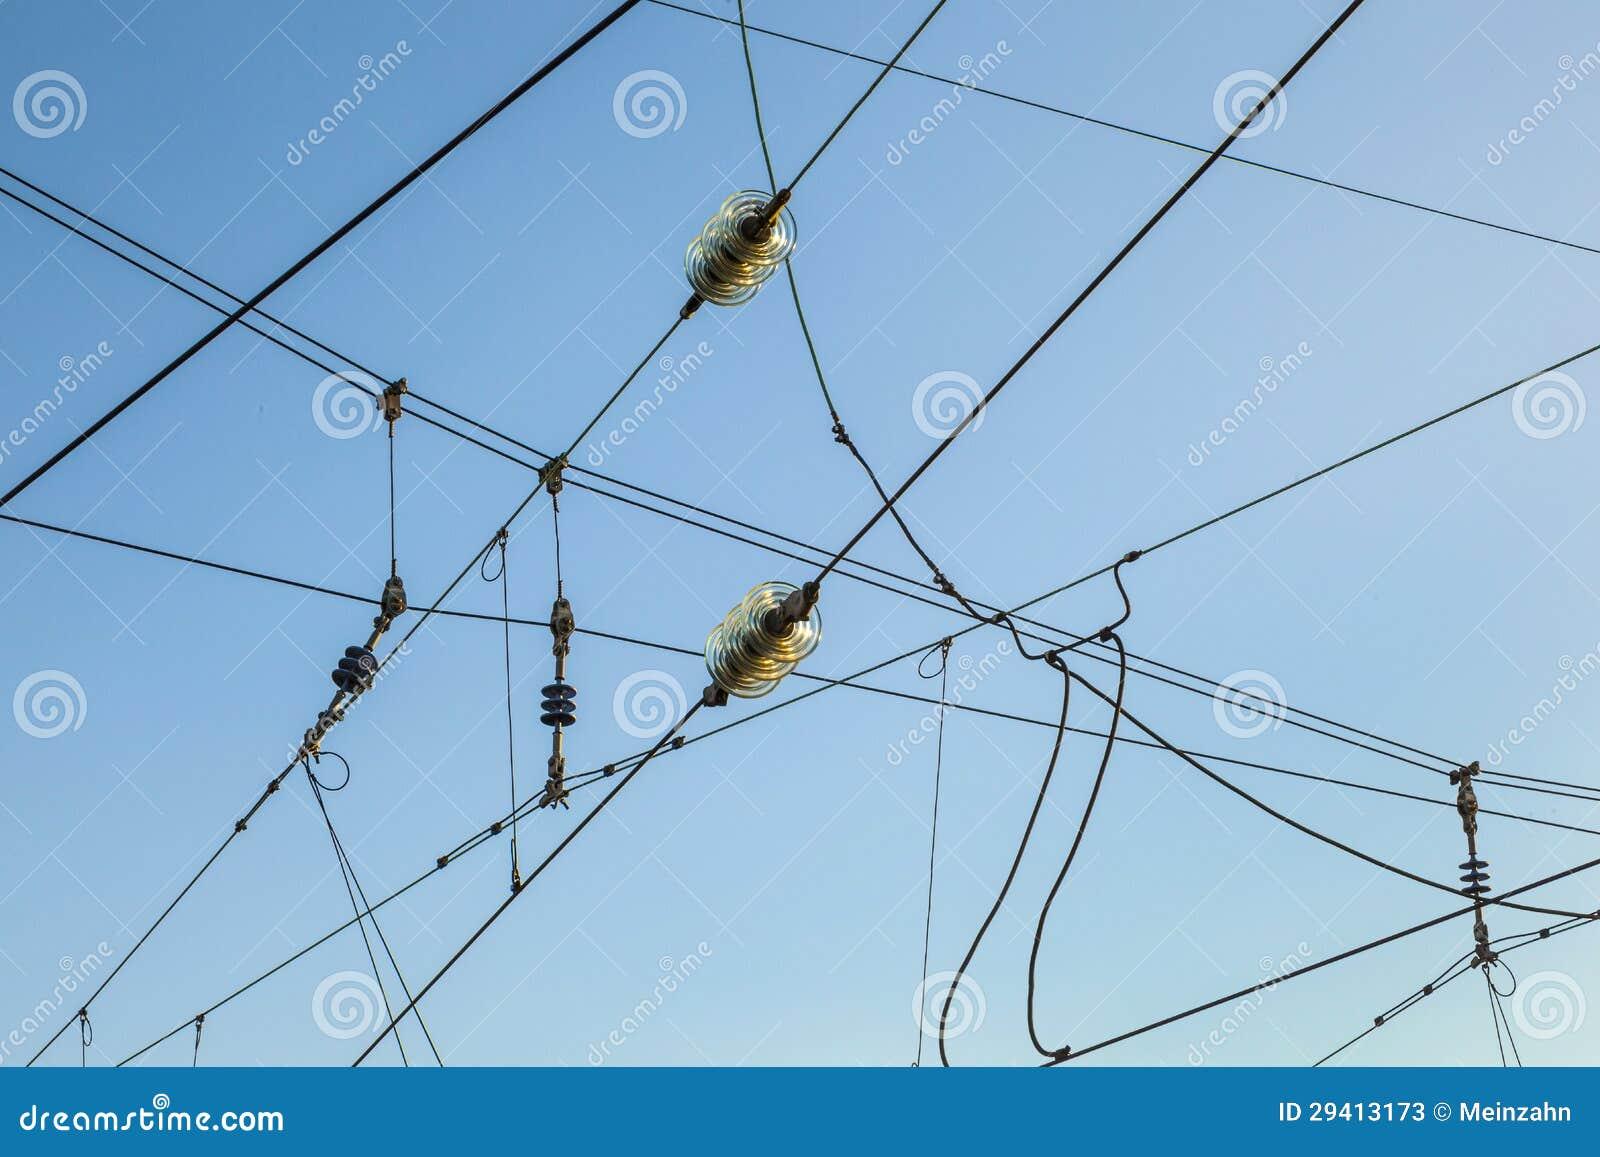 Railroad Overhead Lines Against Clear Blue Sky Stock Photos Image 29413173